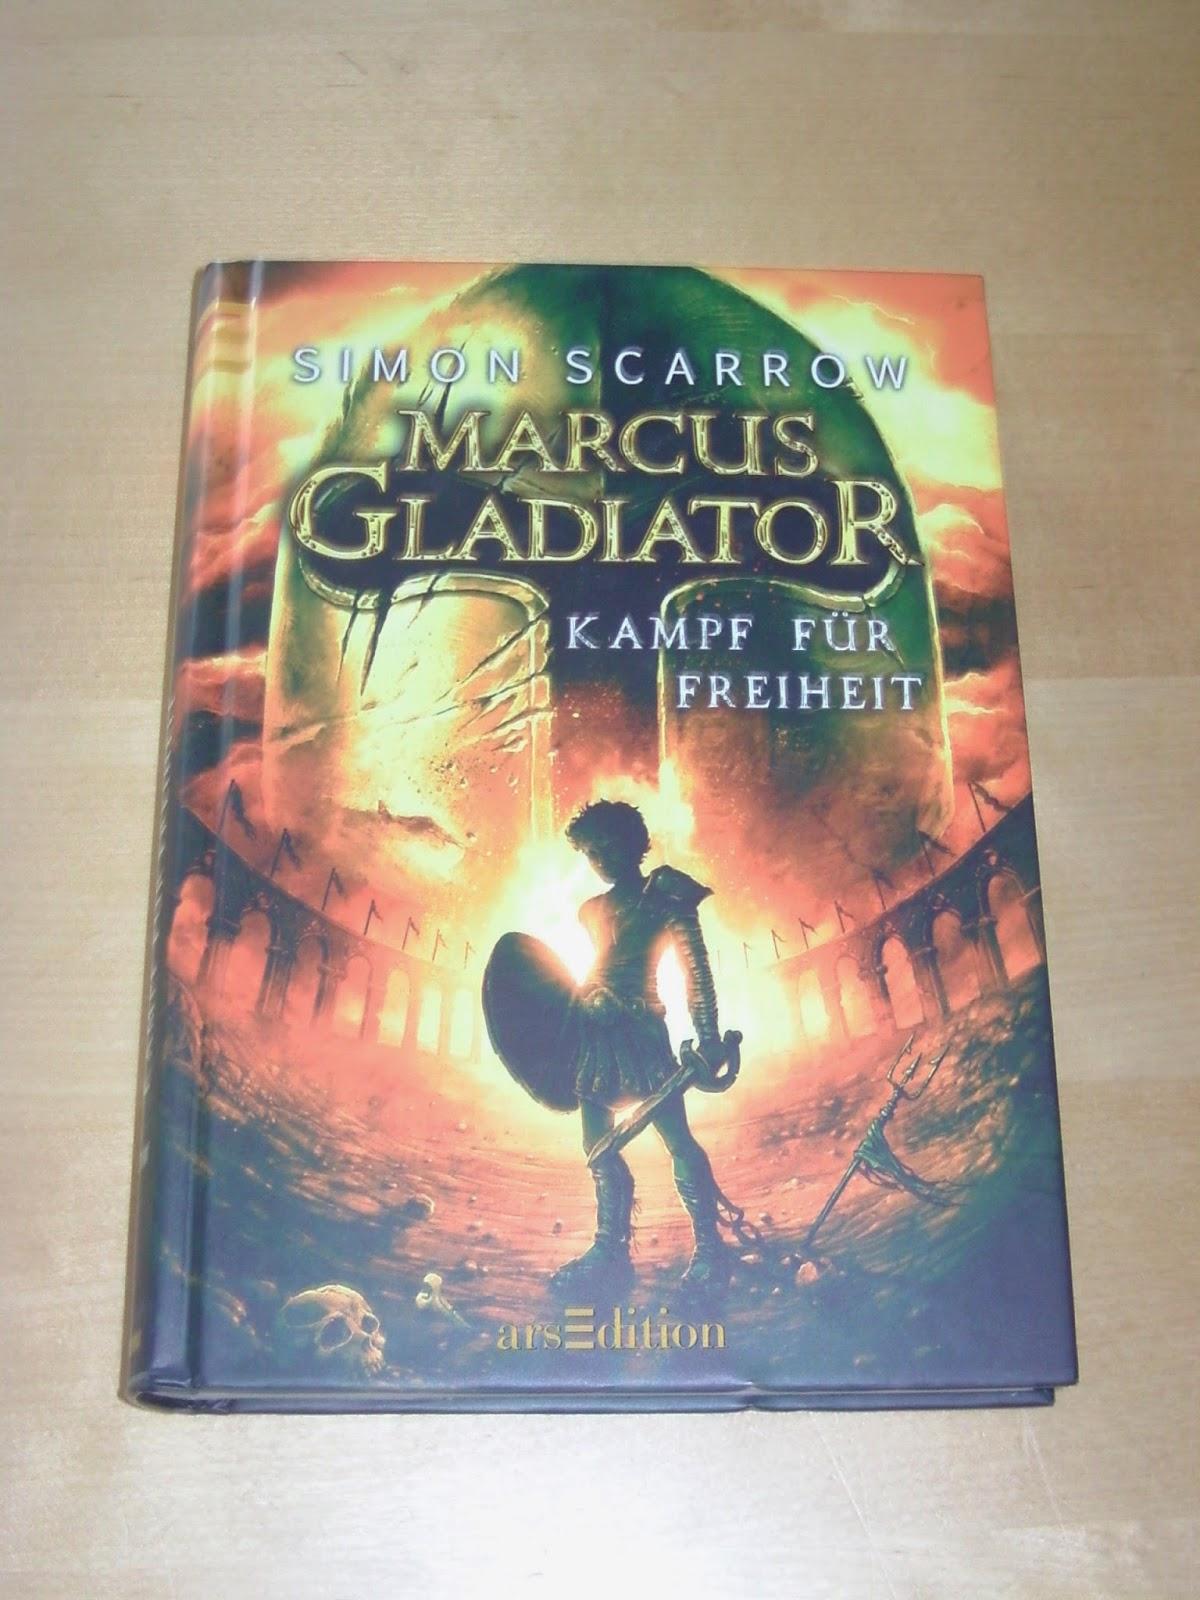 http://www.amazon.de/Marcus-Gladiator-Kampf-f%C3%BCr-Freiheit/dp/3760783775/ref=sr_1_2?s=books&ie=UTF8&qid=1424039760&sr=1-2&keywords=markus+gladiator